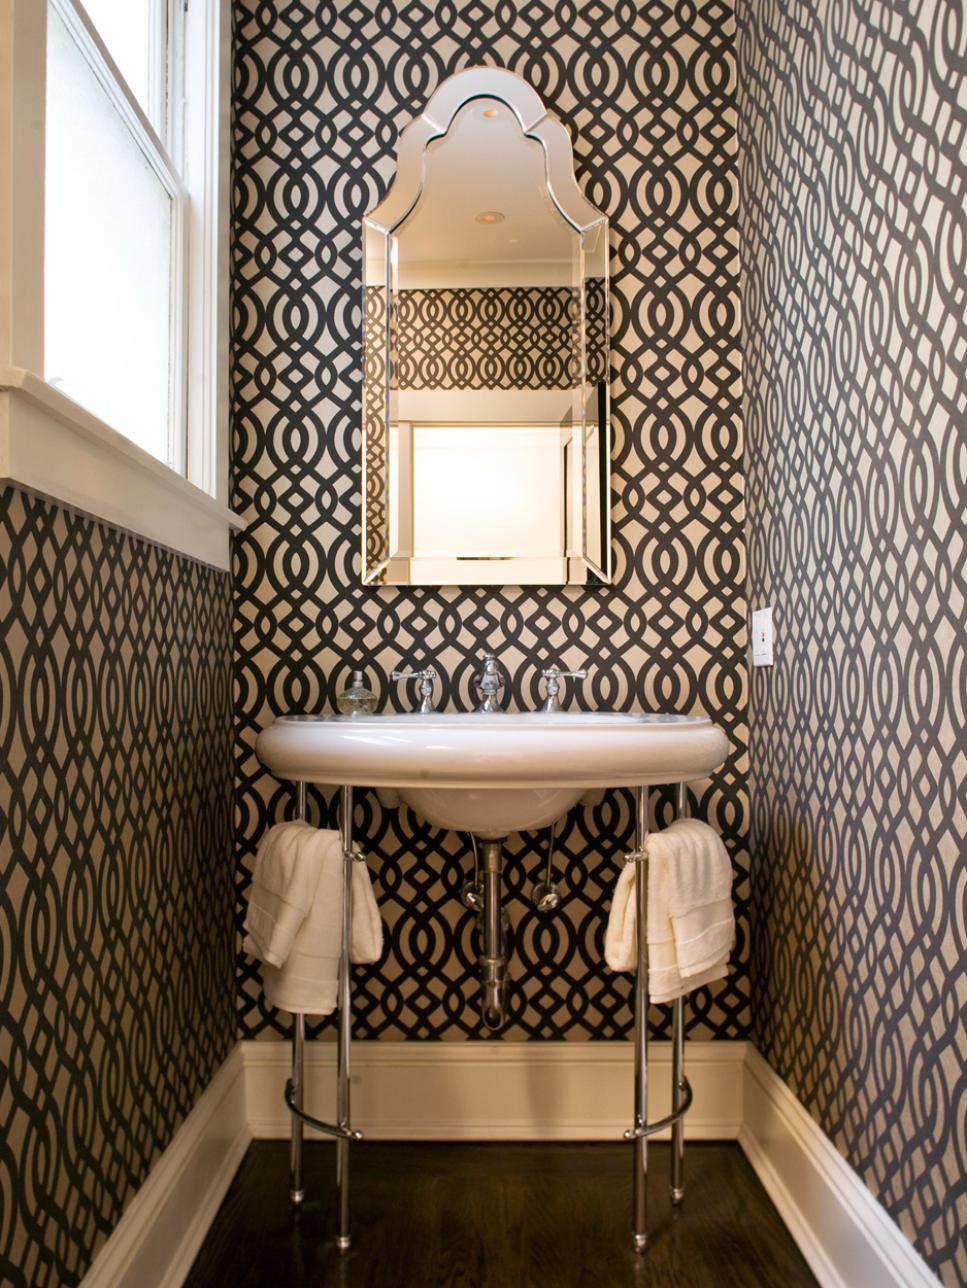 20 Small Bathroom Design Ideas | HGTV